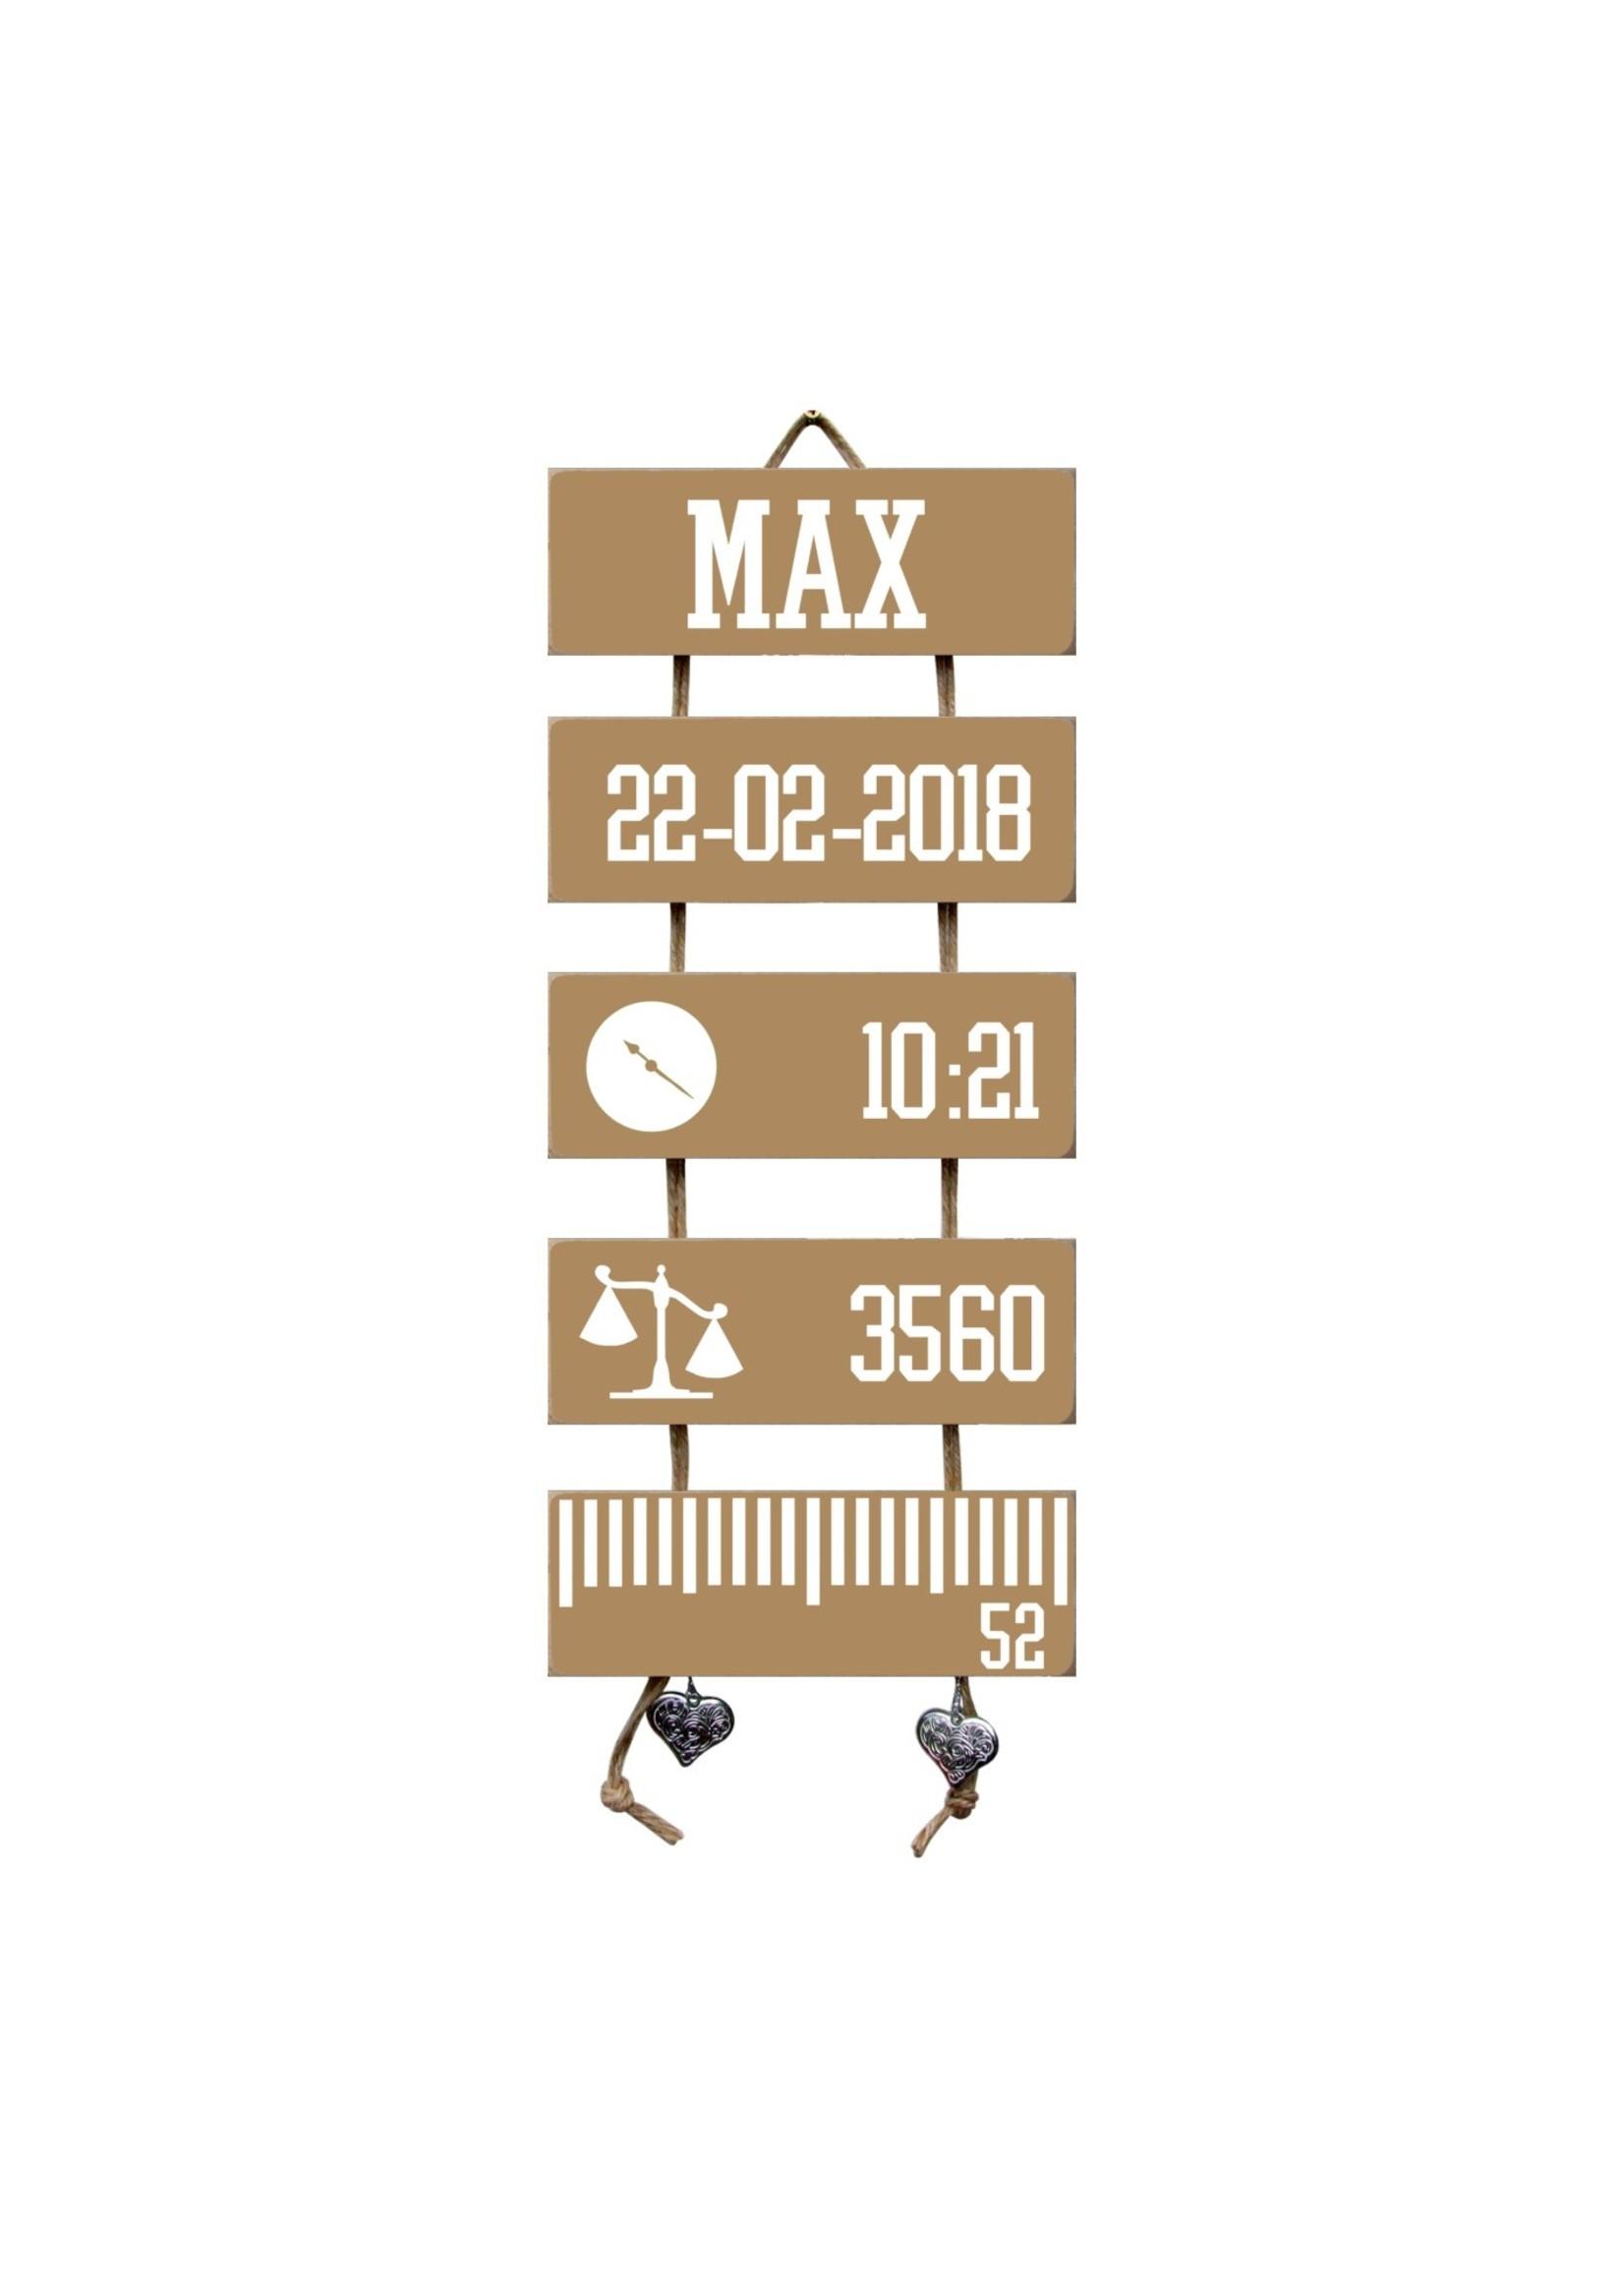 Kraamcadeau Geboorteladder Max Spiced Honey Flexa